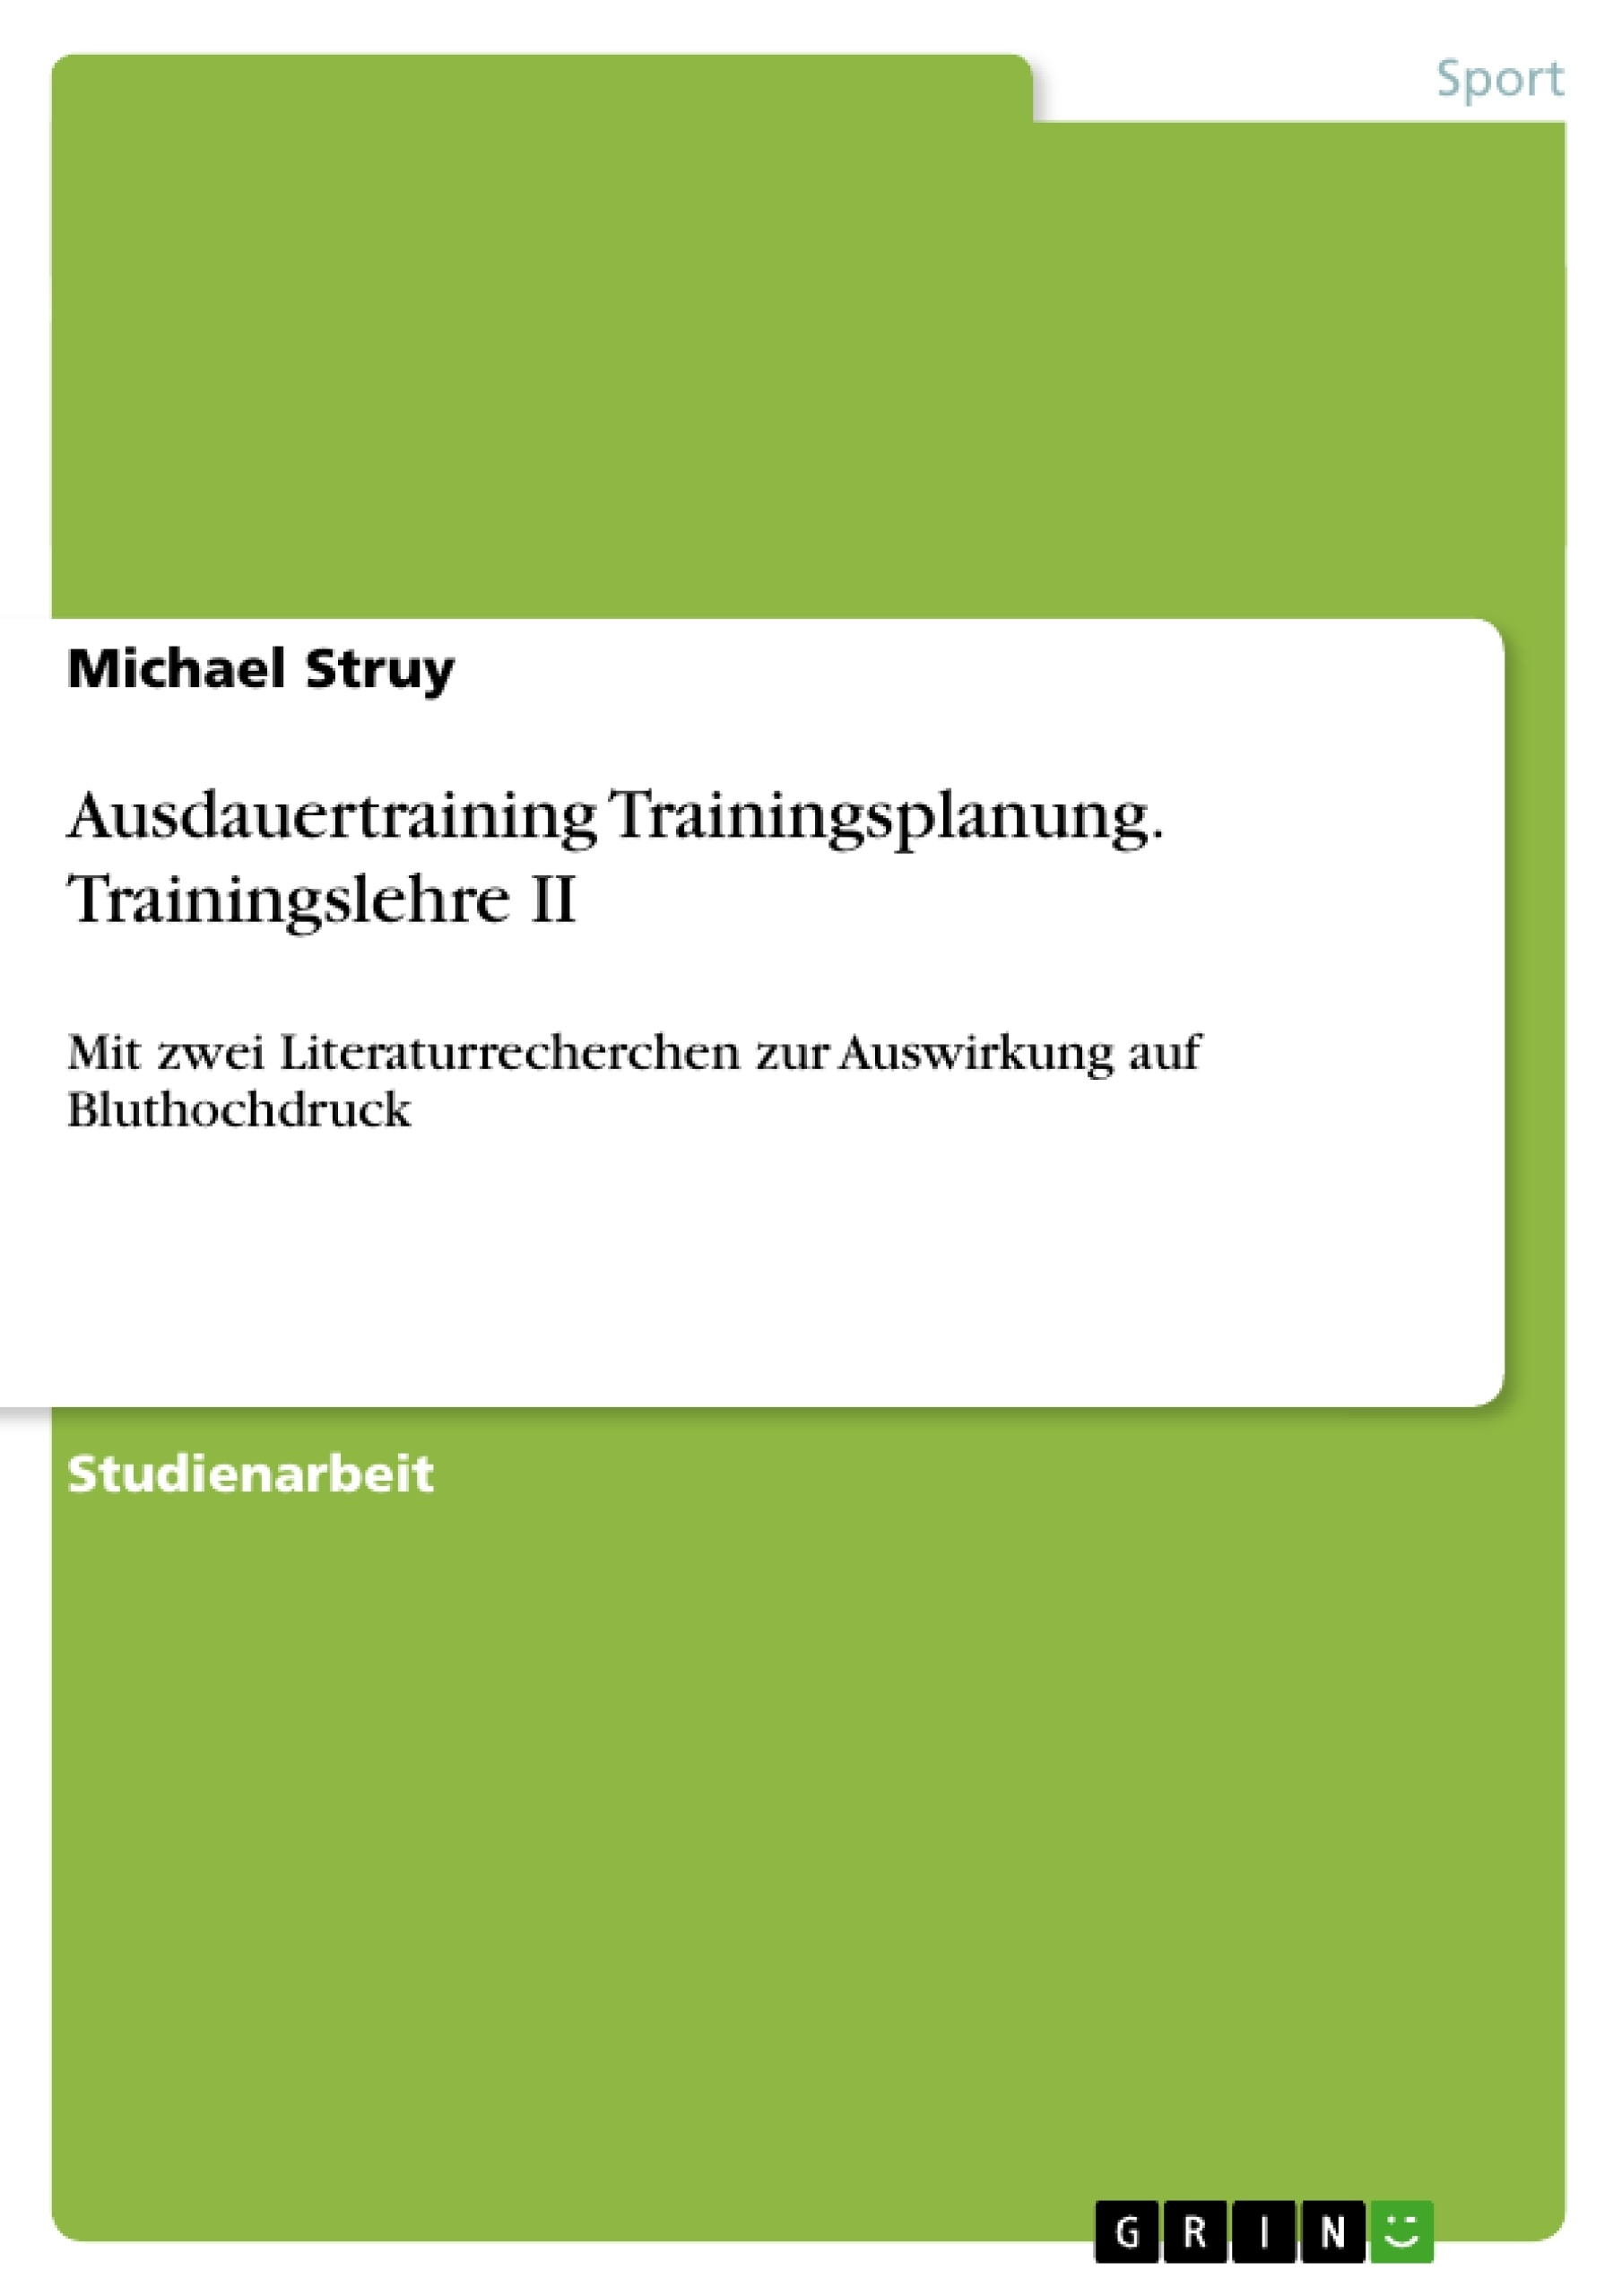 Titel: Ausdauertraining Trainingsplanung. Trainingslehre II